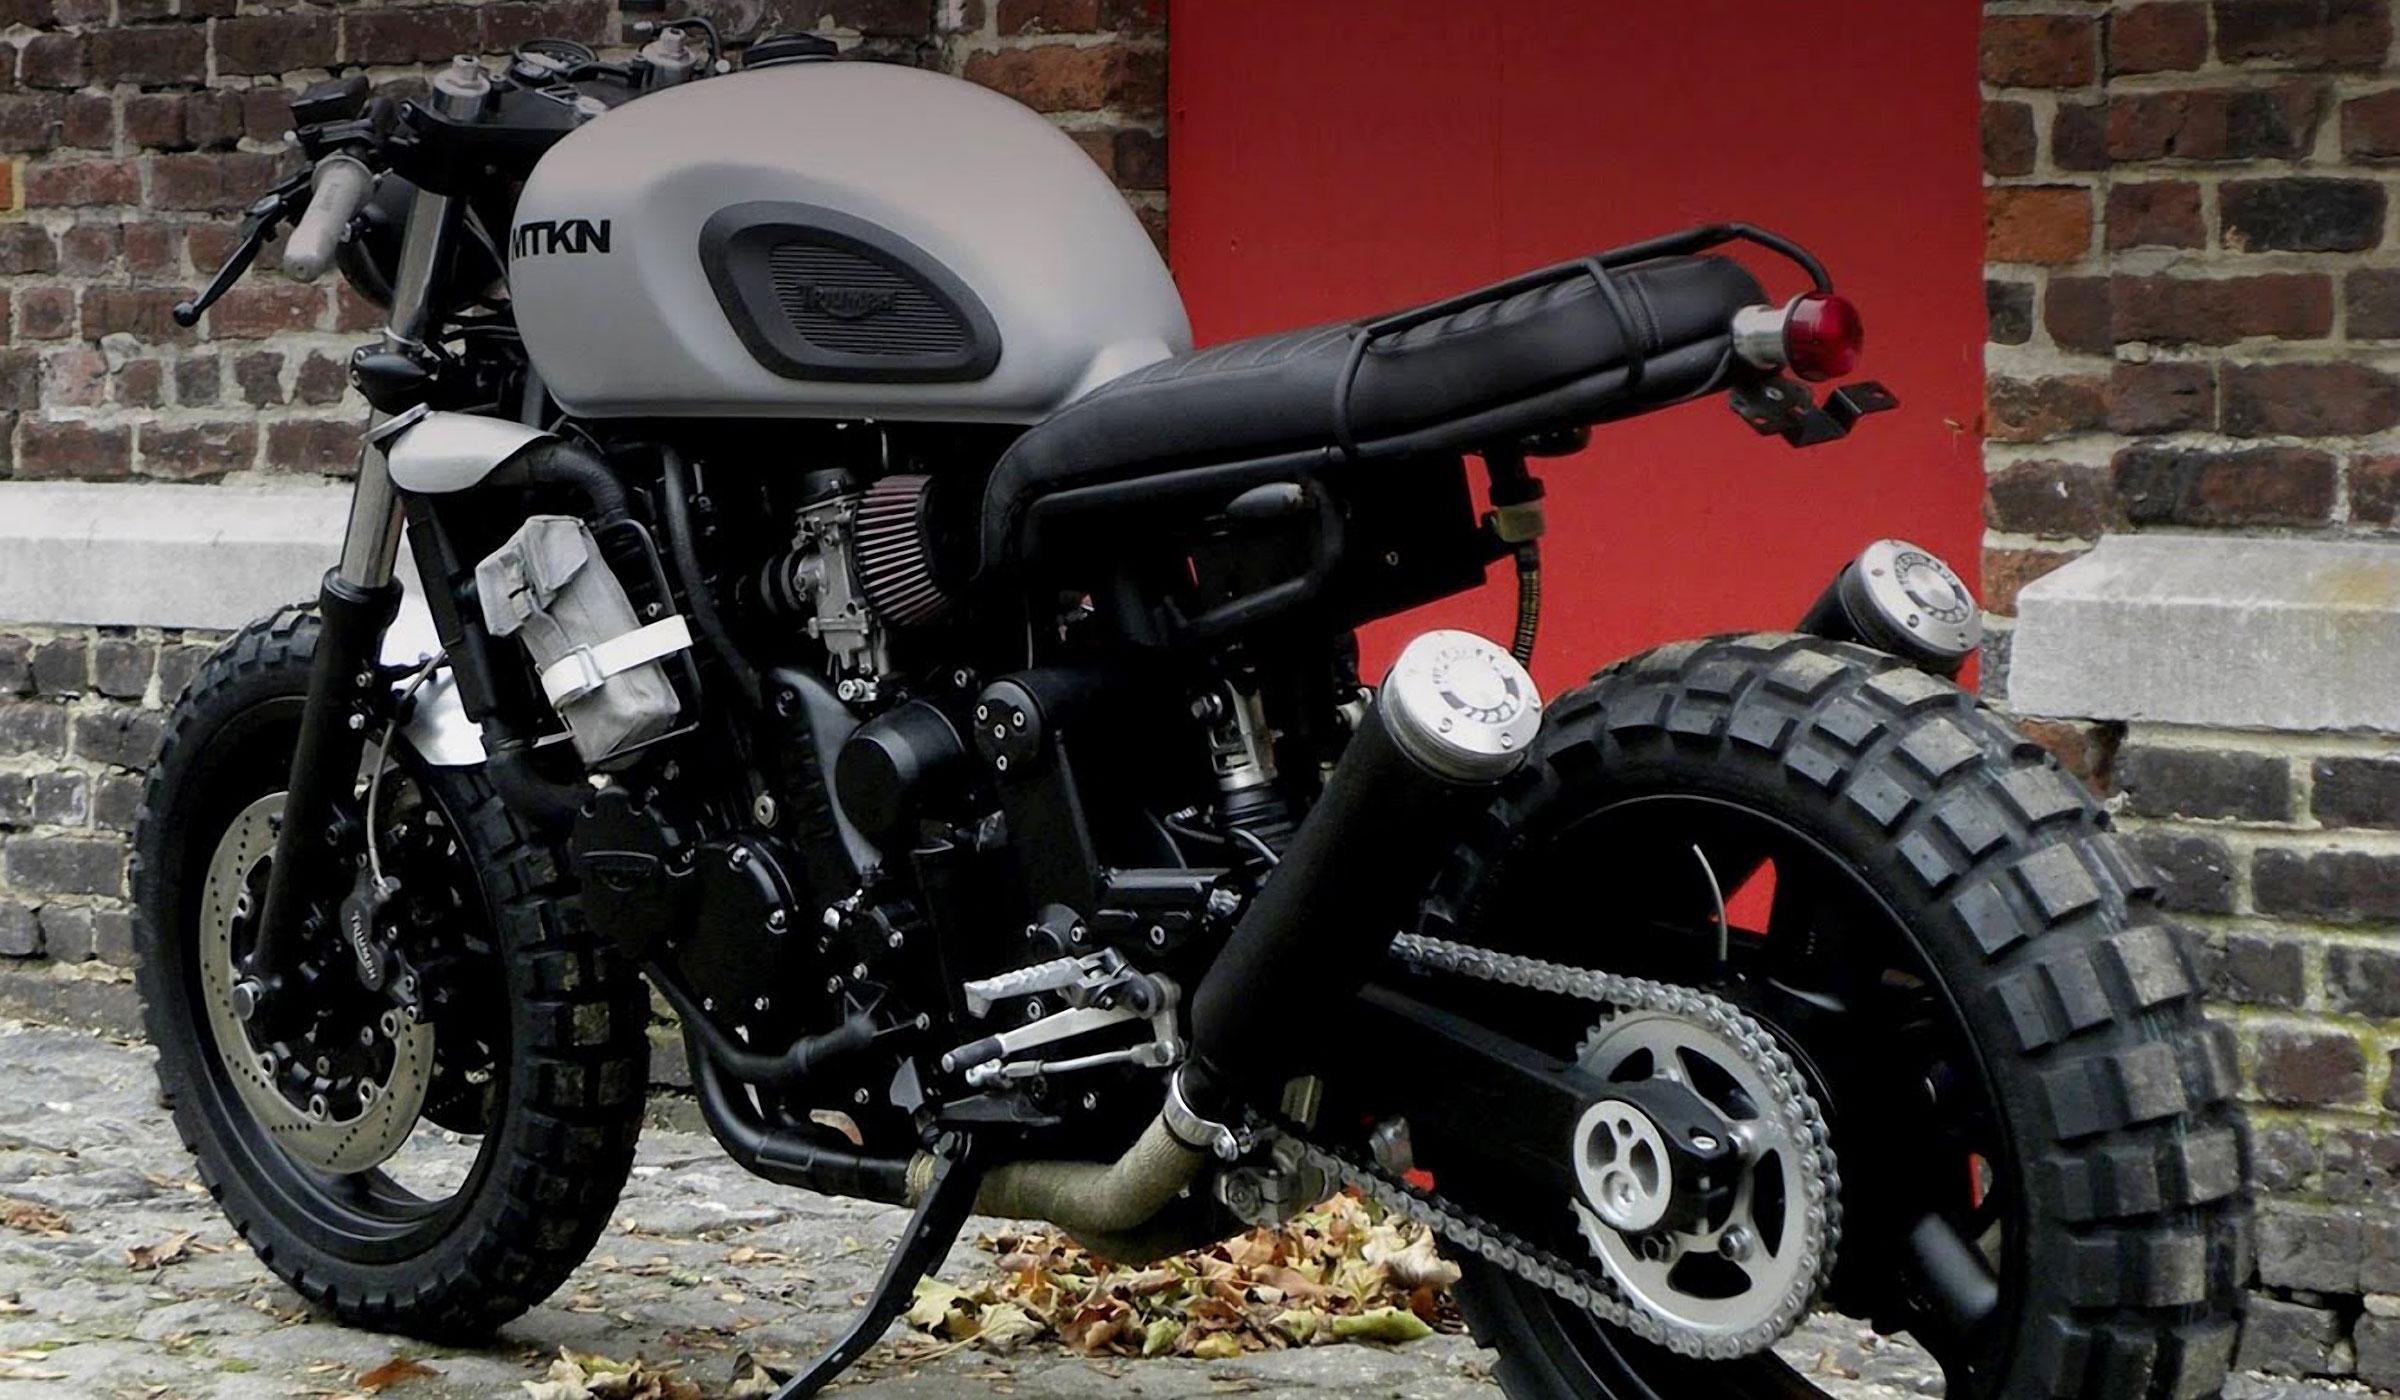 MK20-MTKN-motorcycle-003